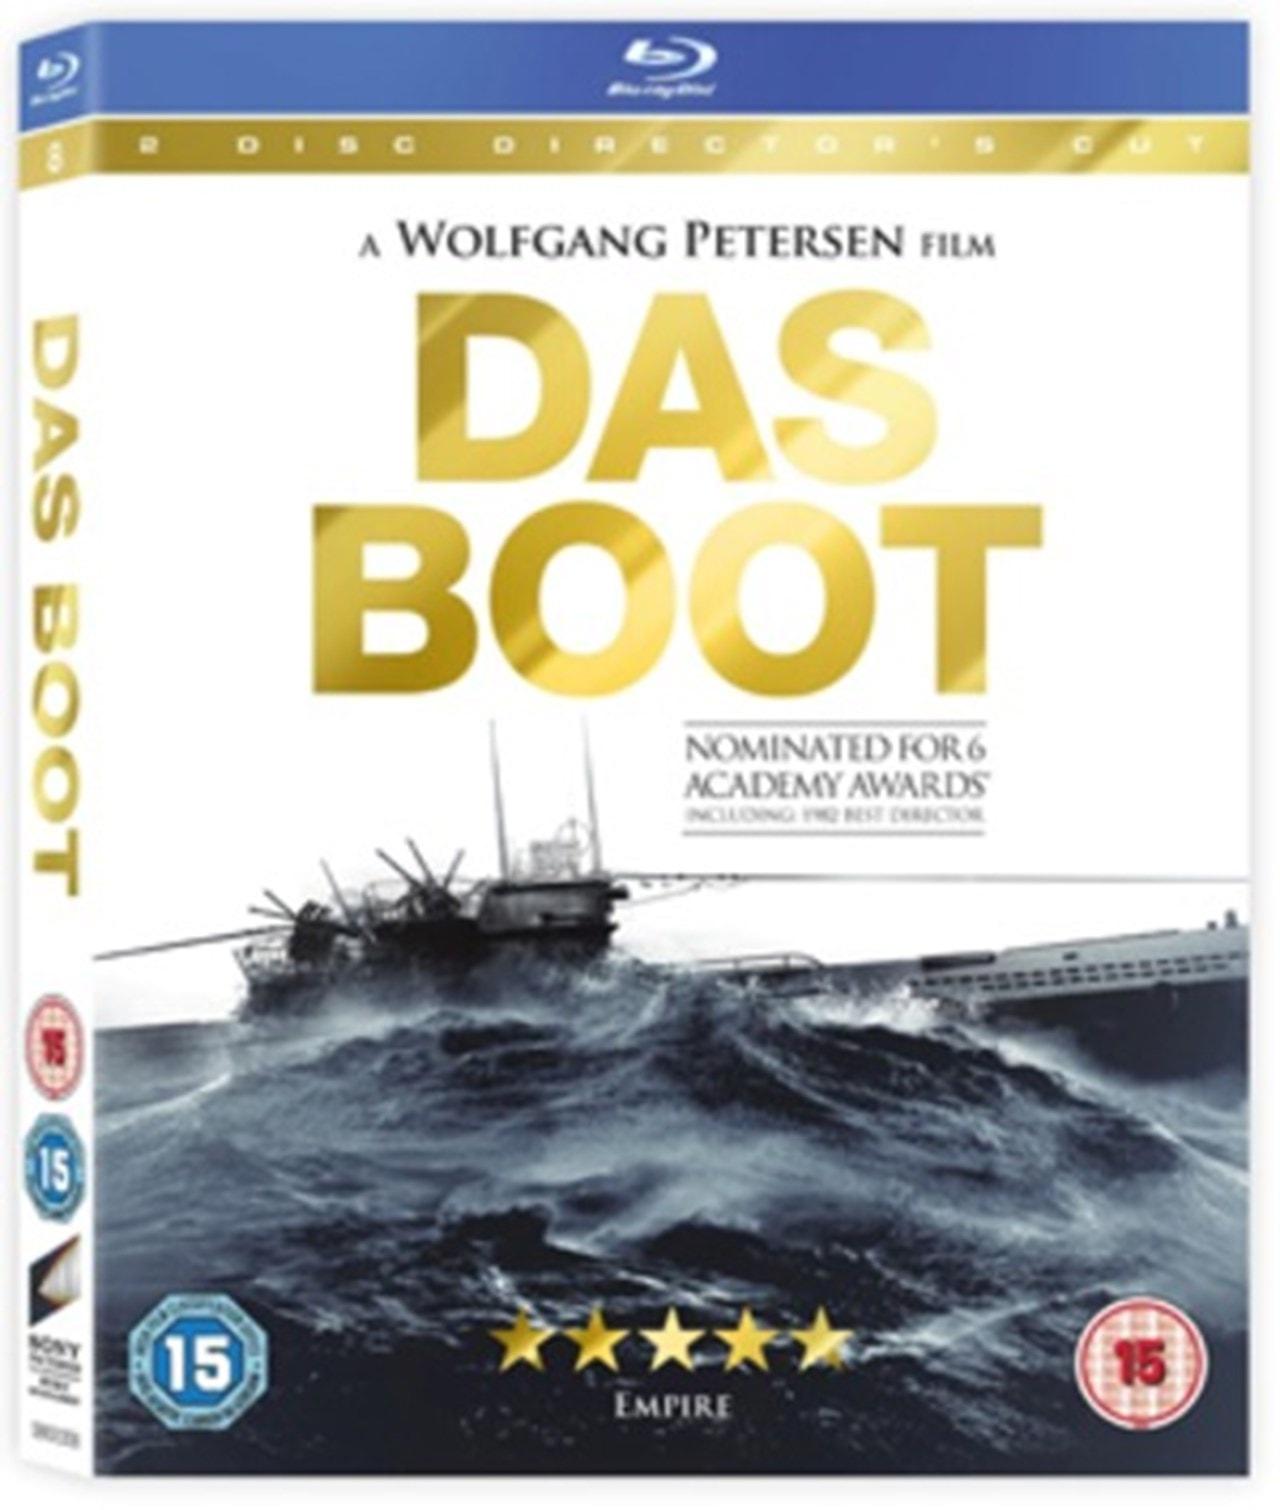 Das Boot: The Director's Cut - 1